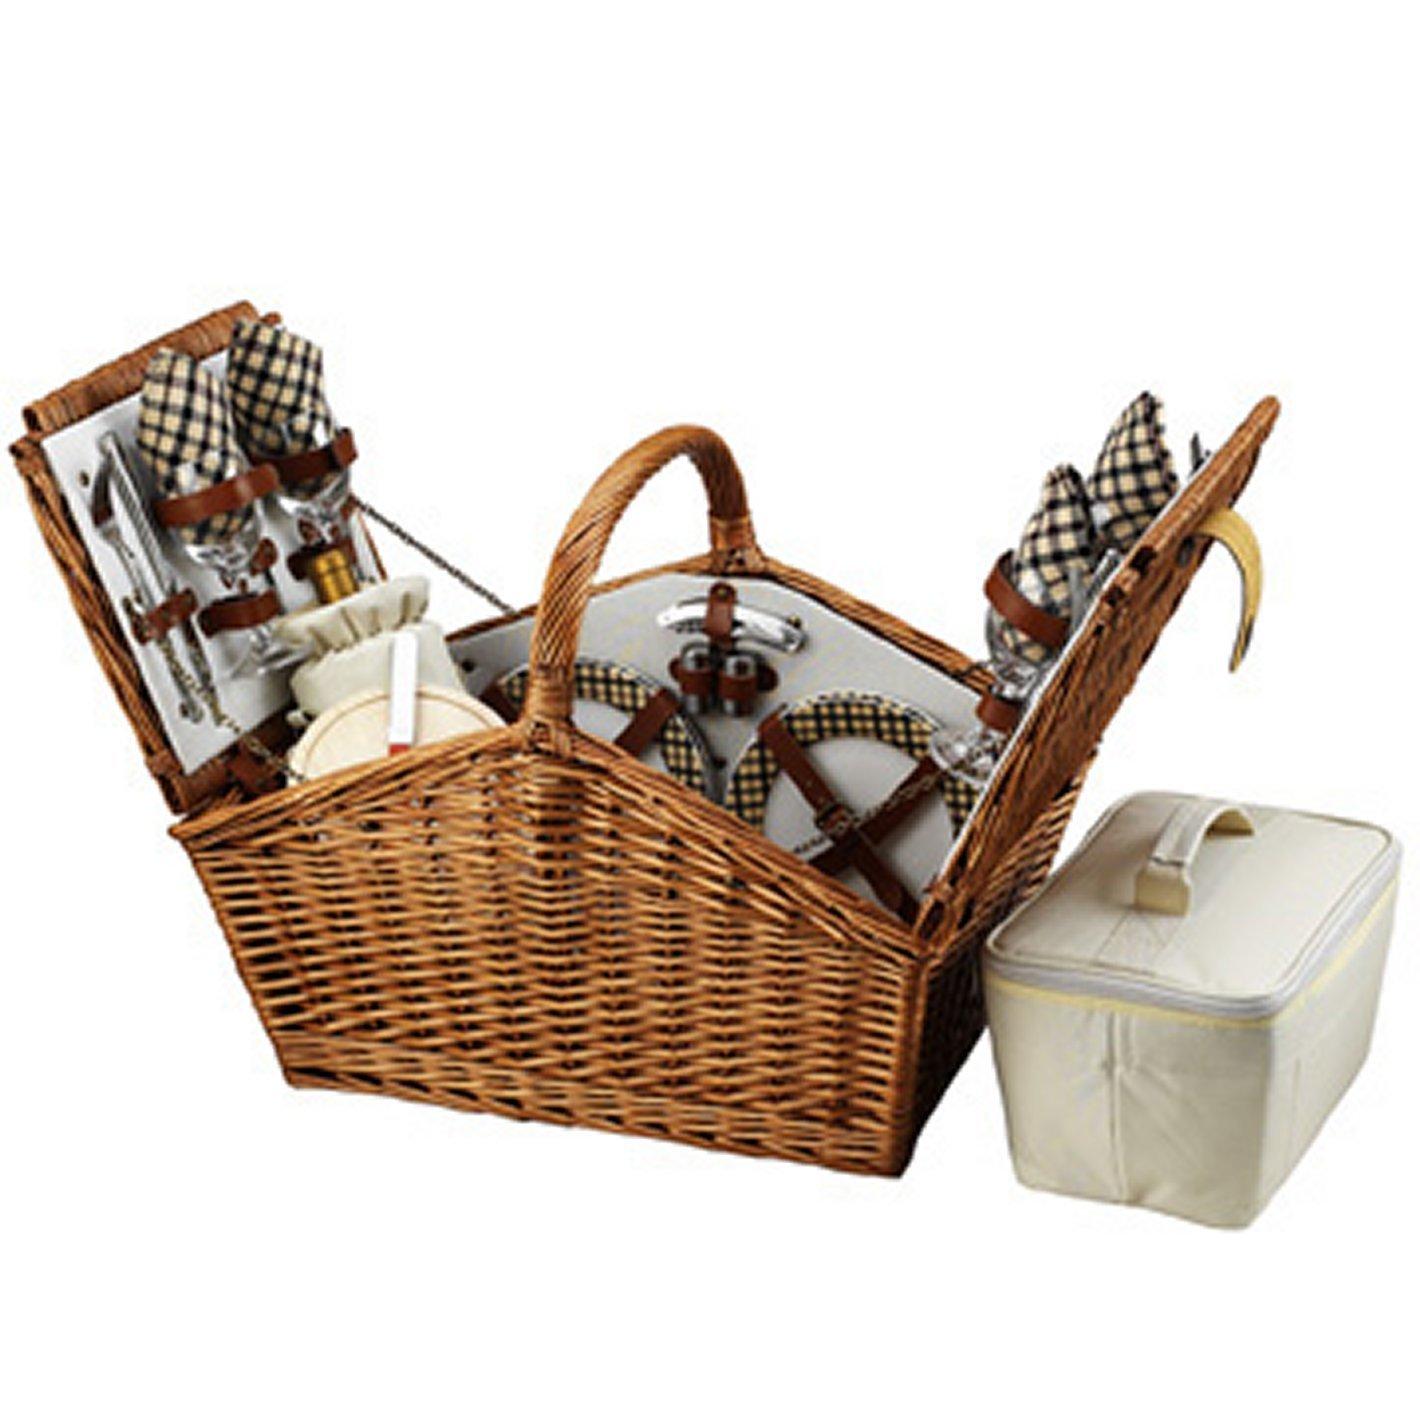 Amazon.com: Picnic at Ascot Huntsman English-Style Willow Picnic ...